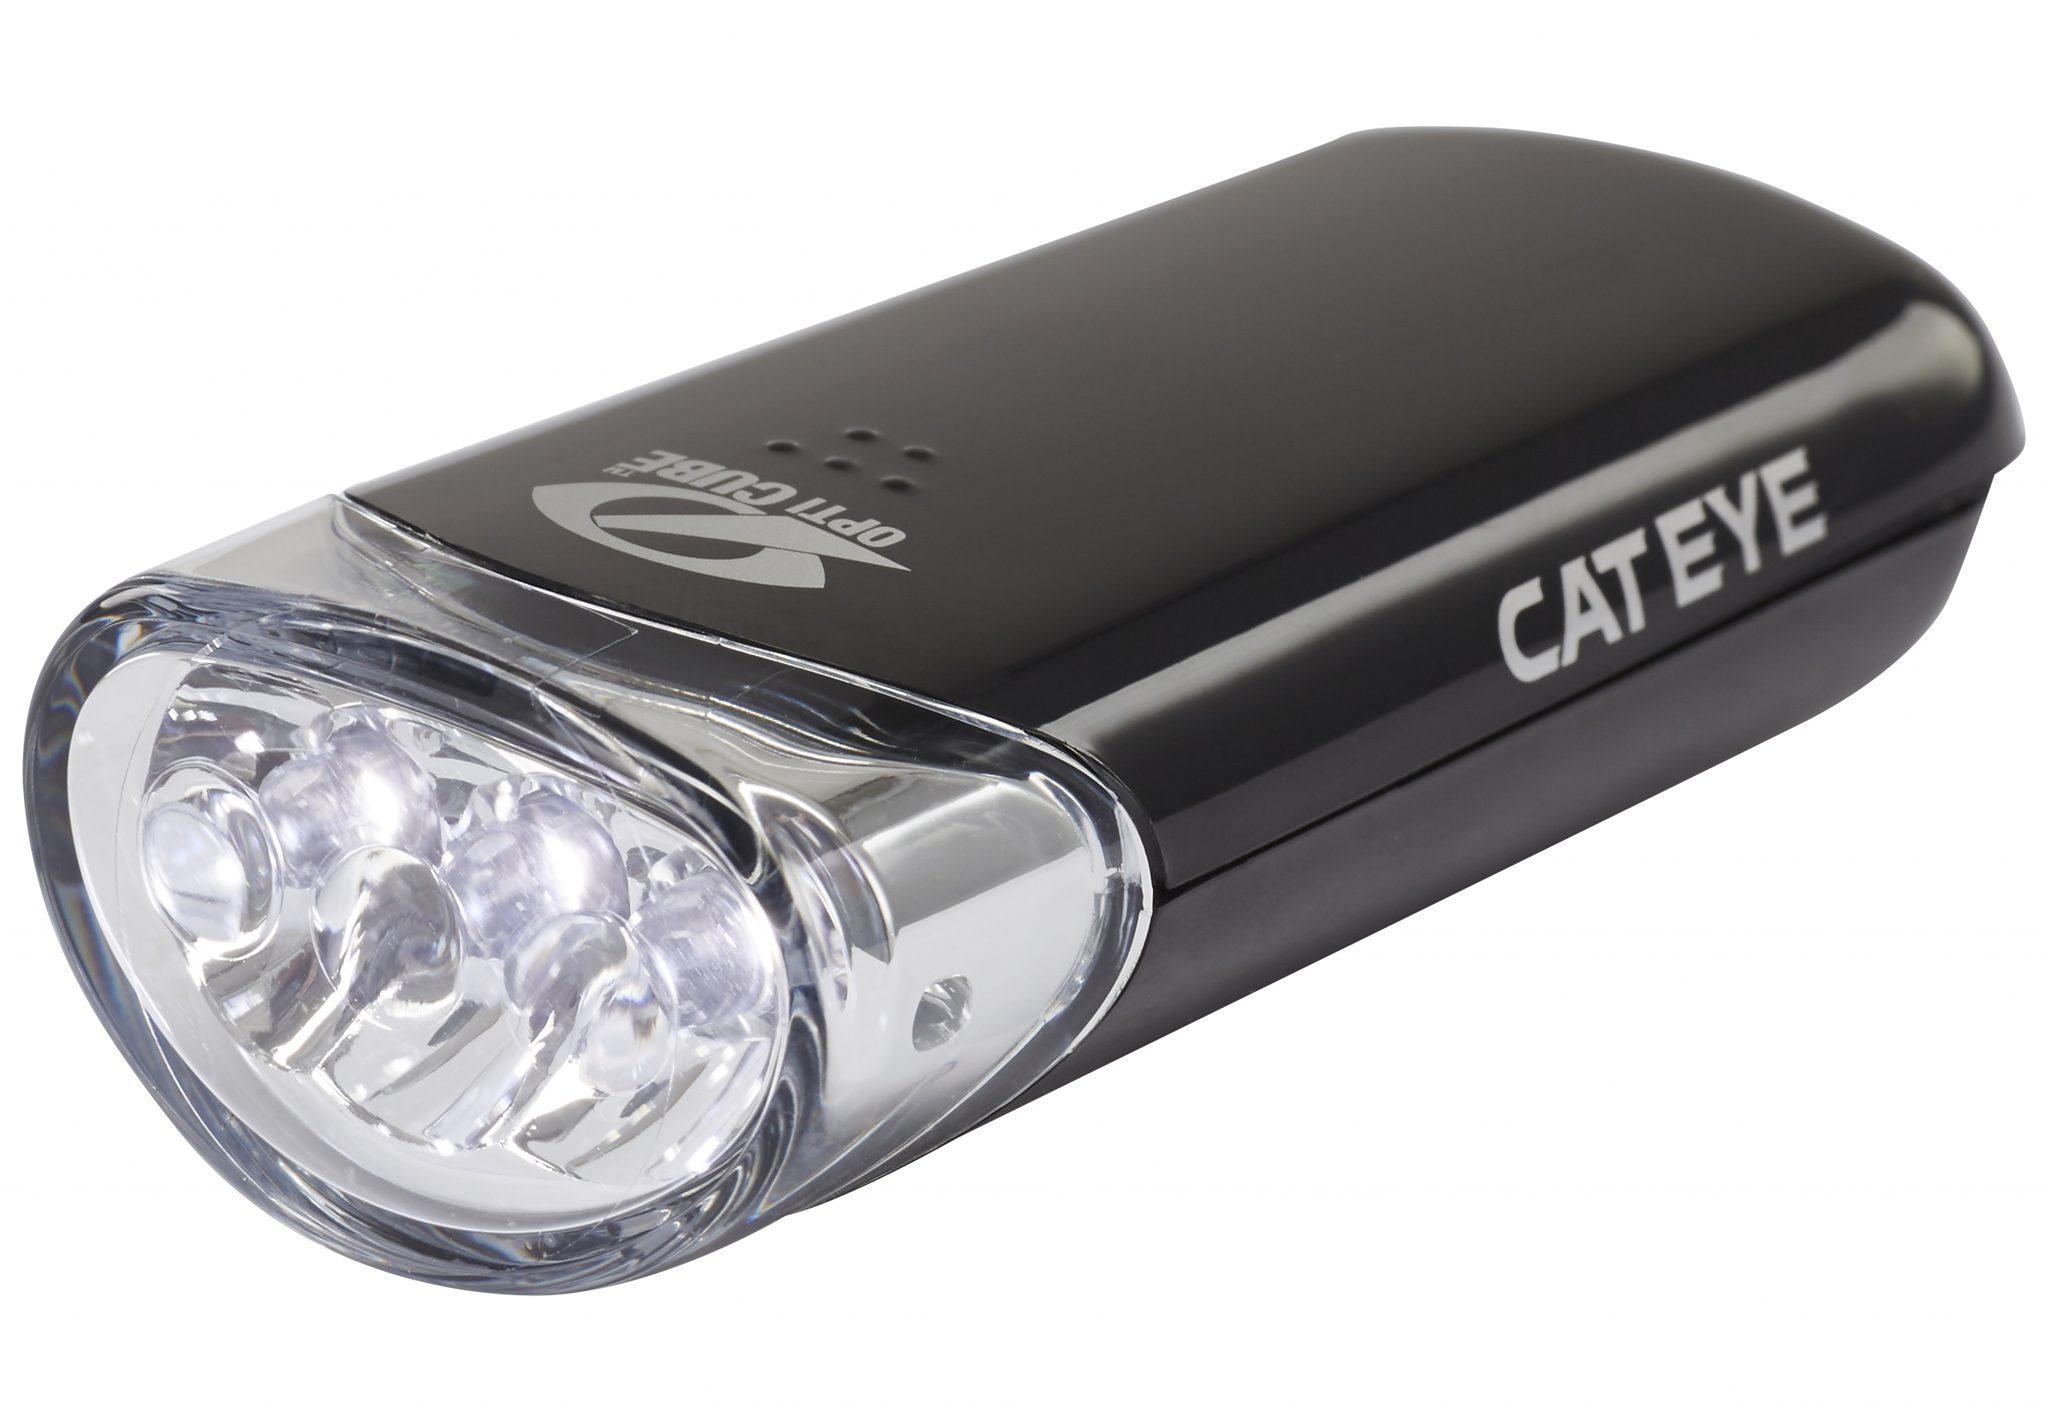 Cateye Fahrradbeleuchtung »HL-EL 135 N Frontscheinwerfer«